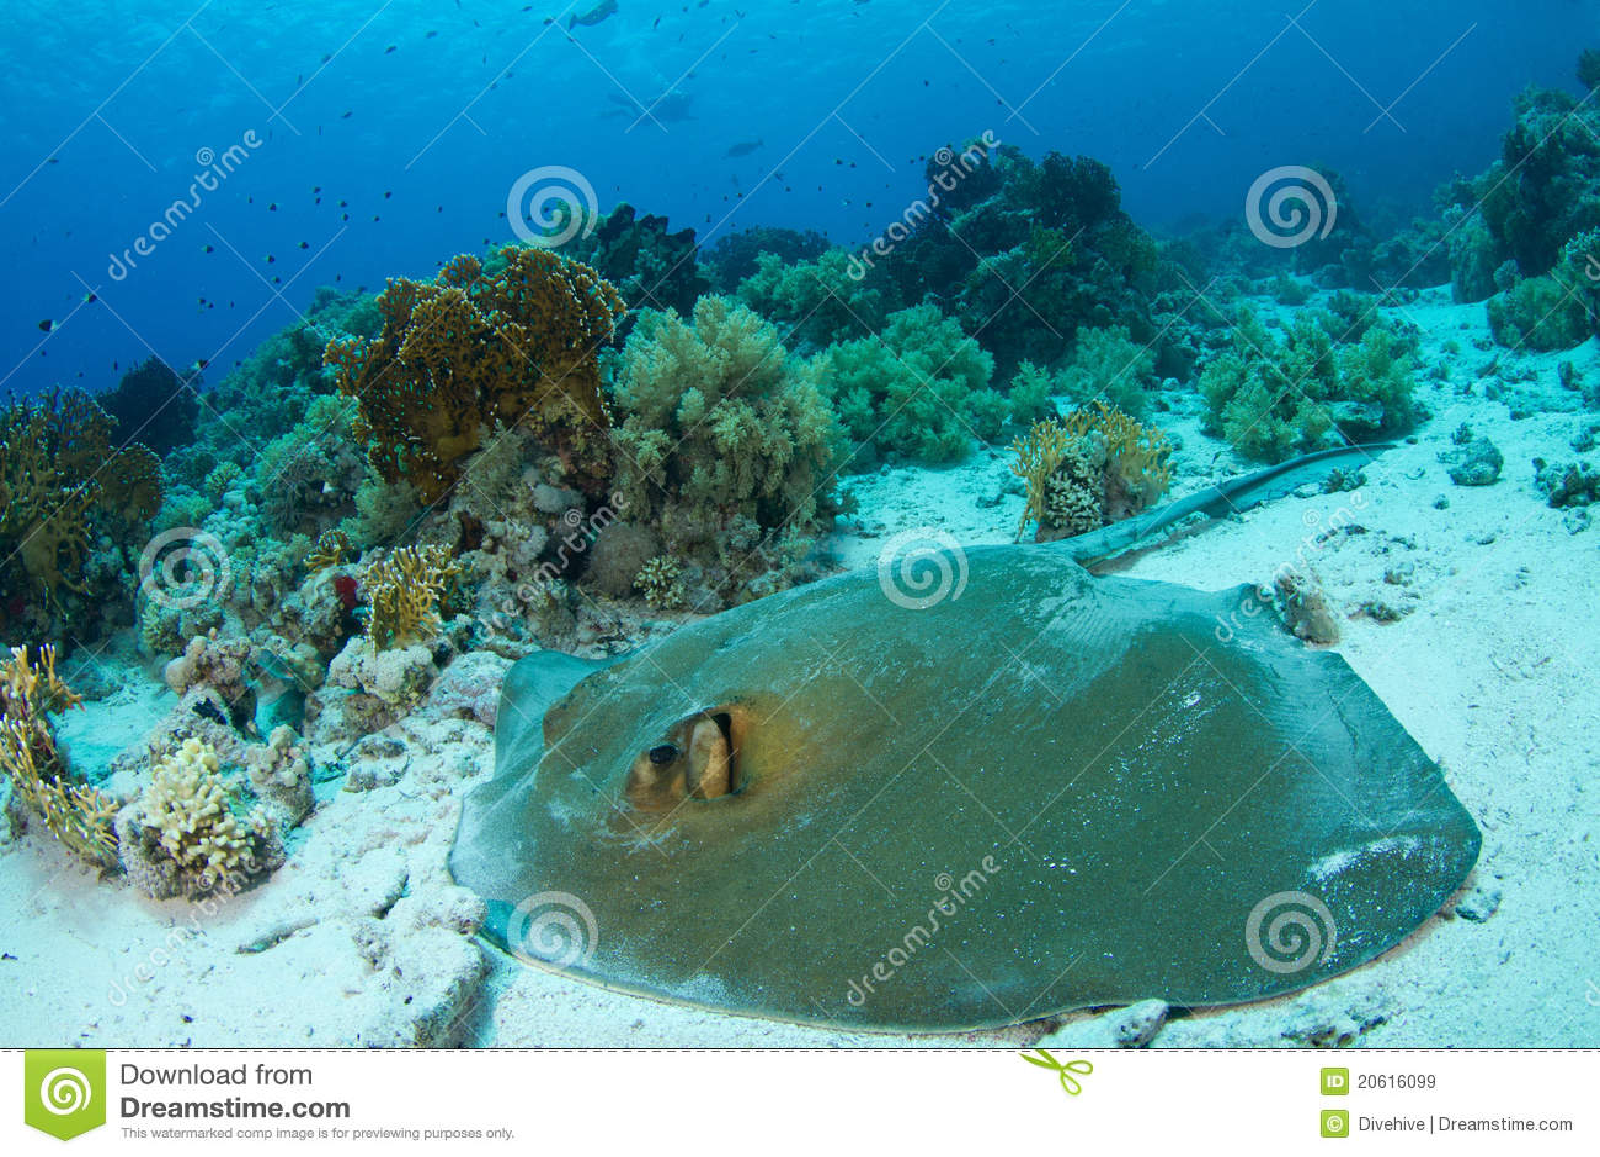 Feathertail stingray